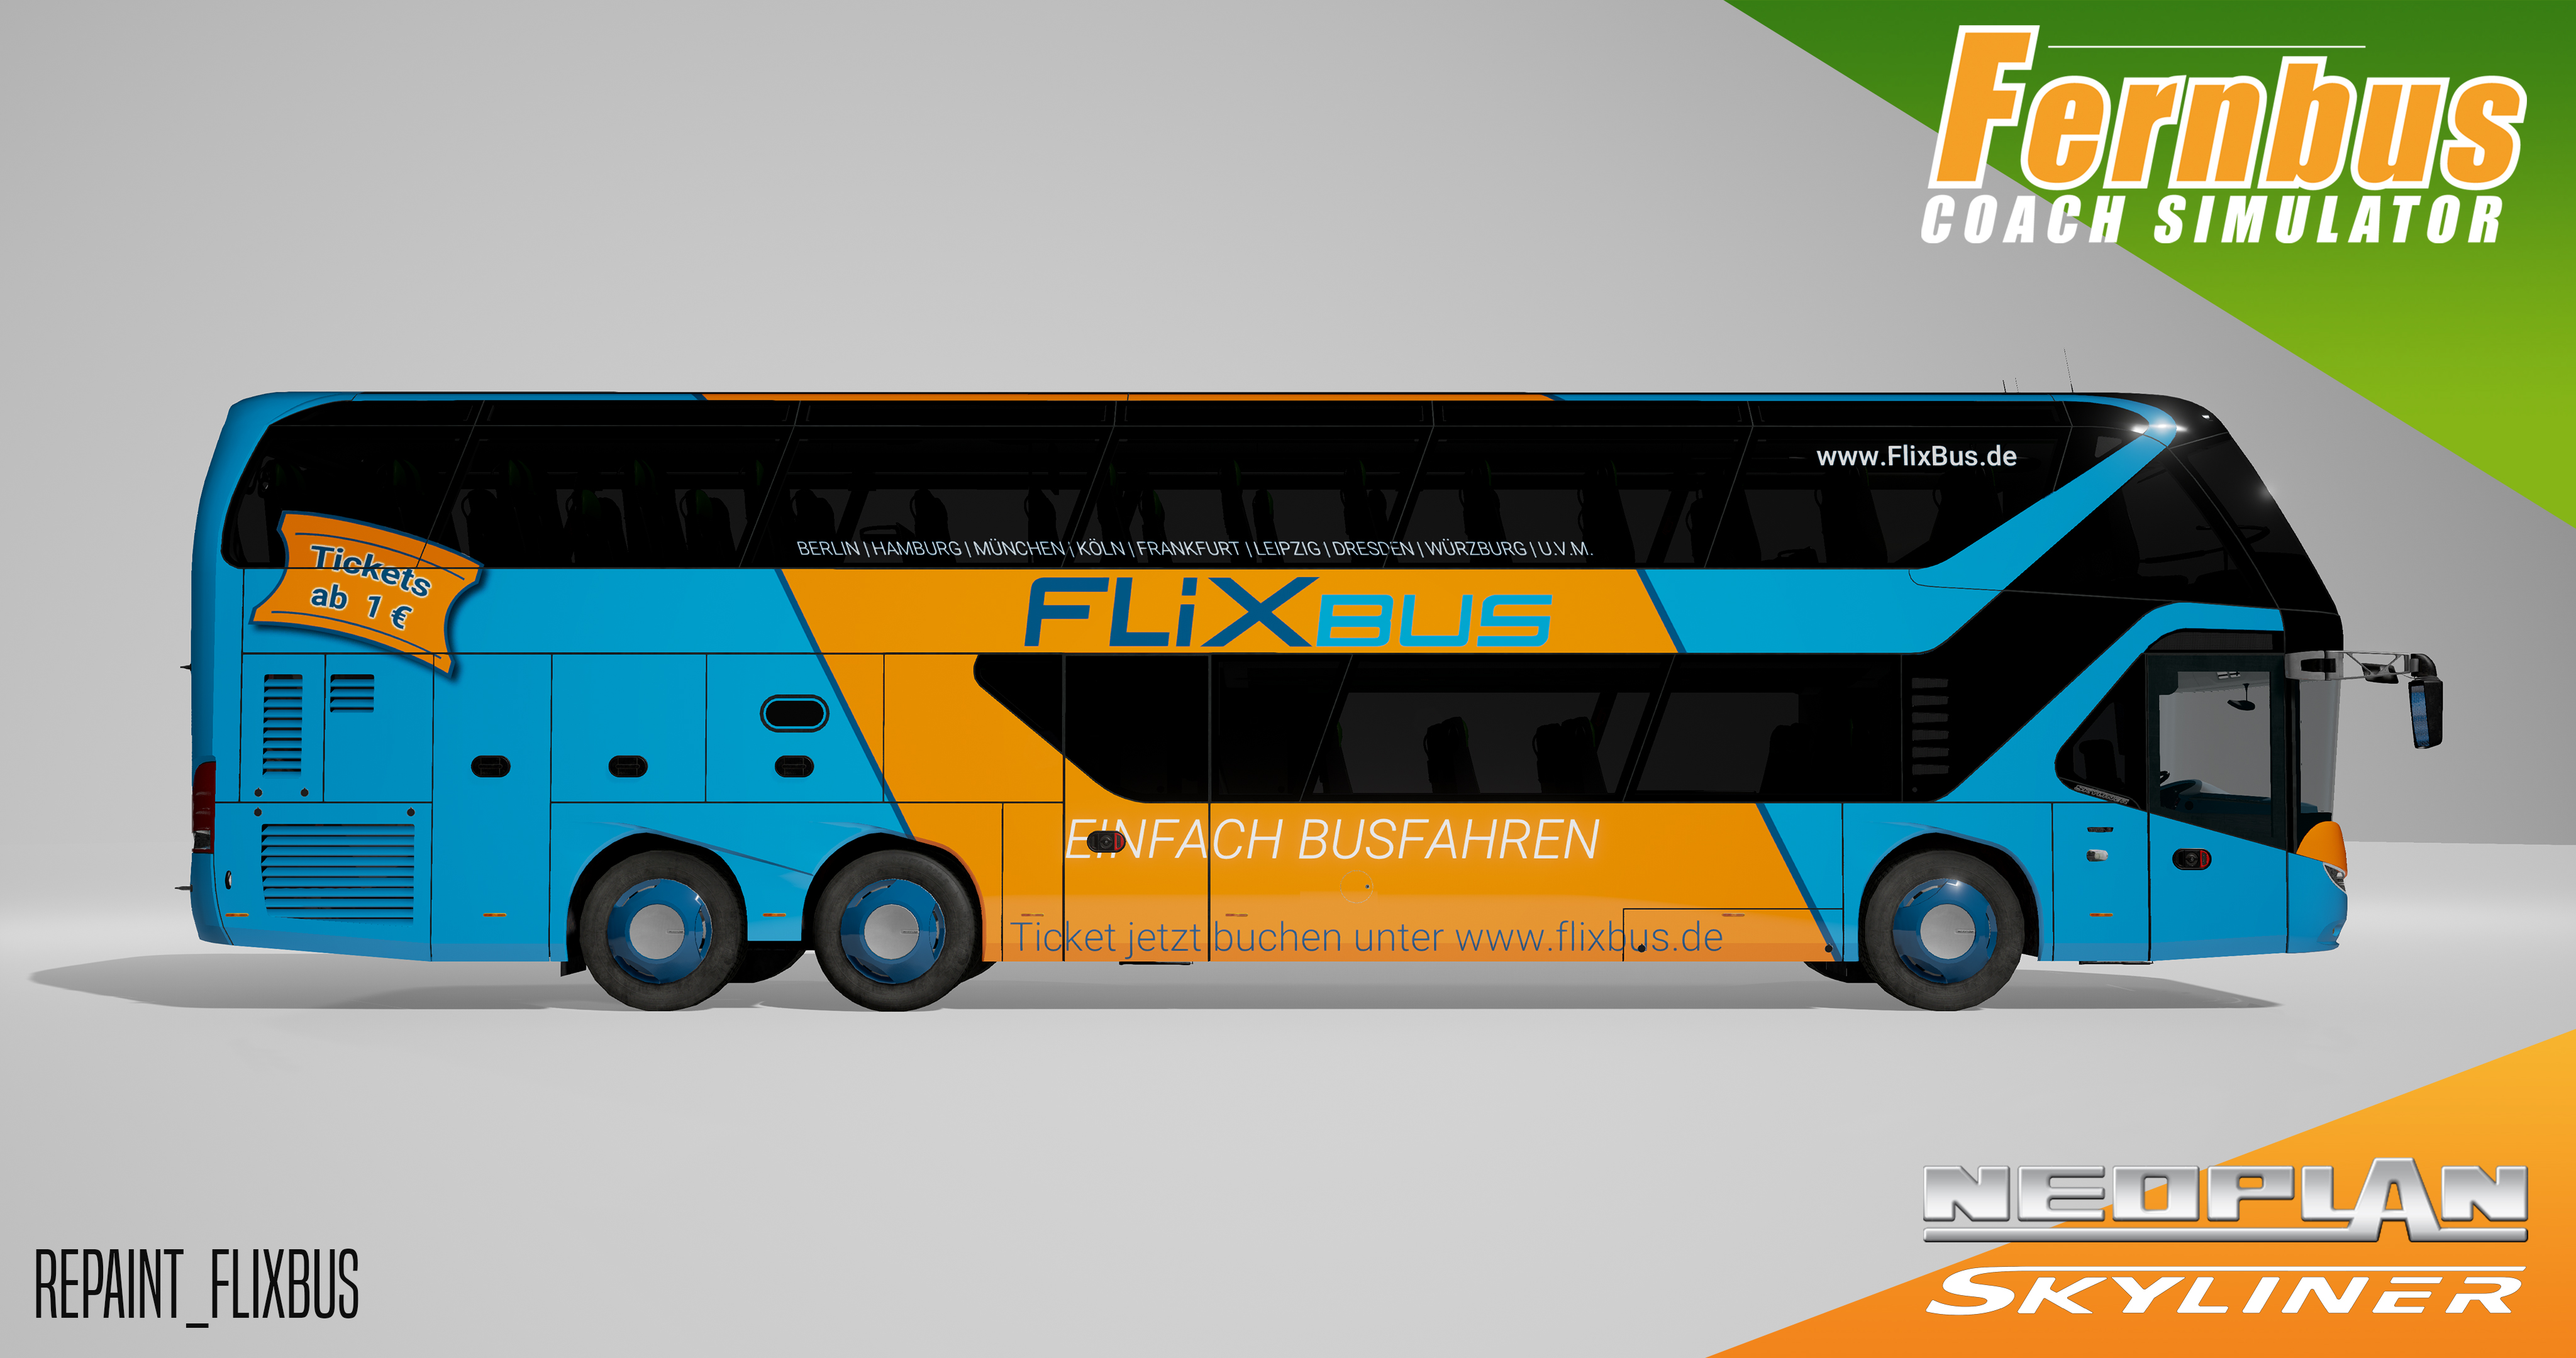 Fernbus Simulator - Neoplan Skyliner screenshot